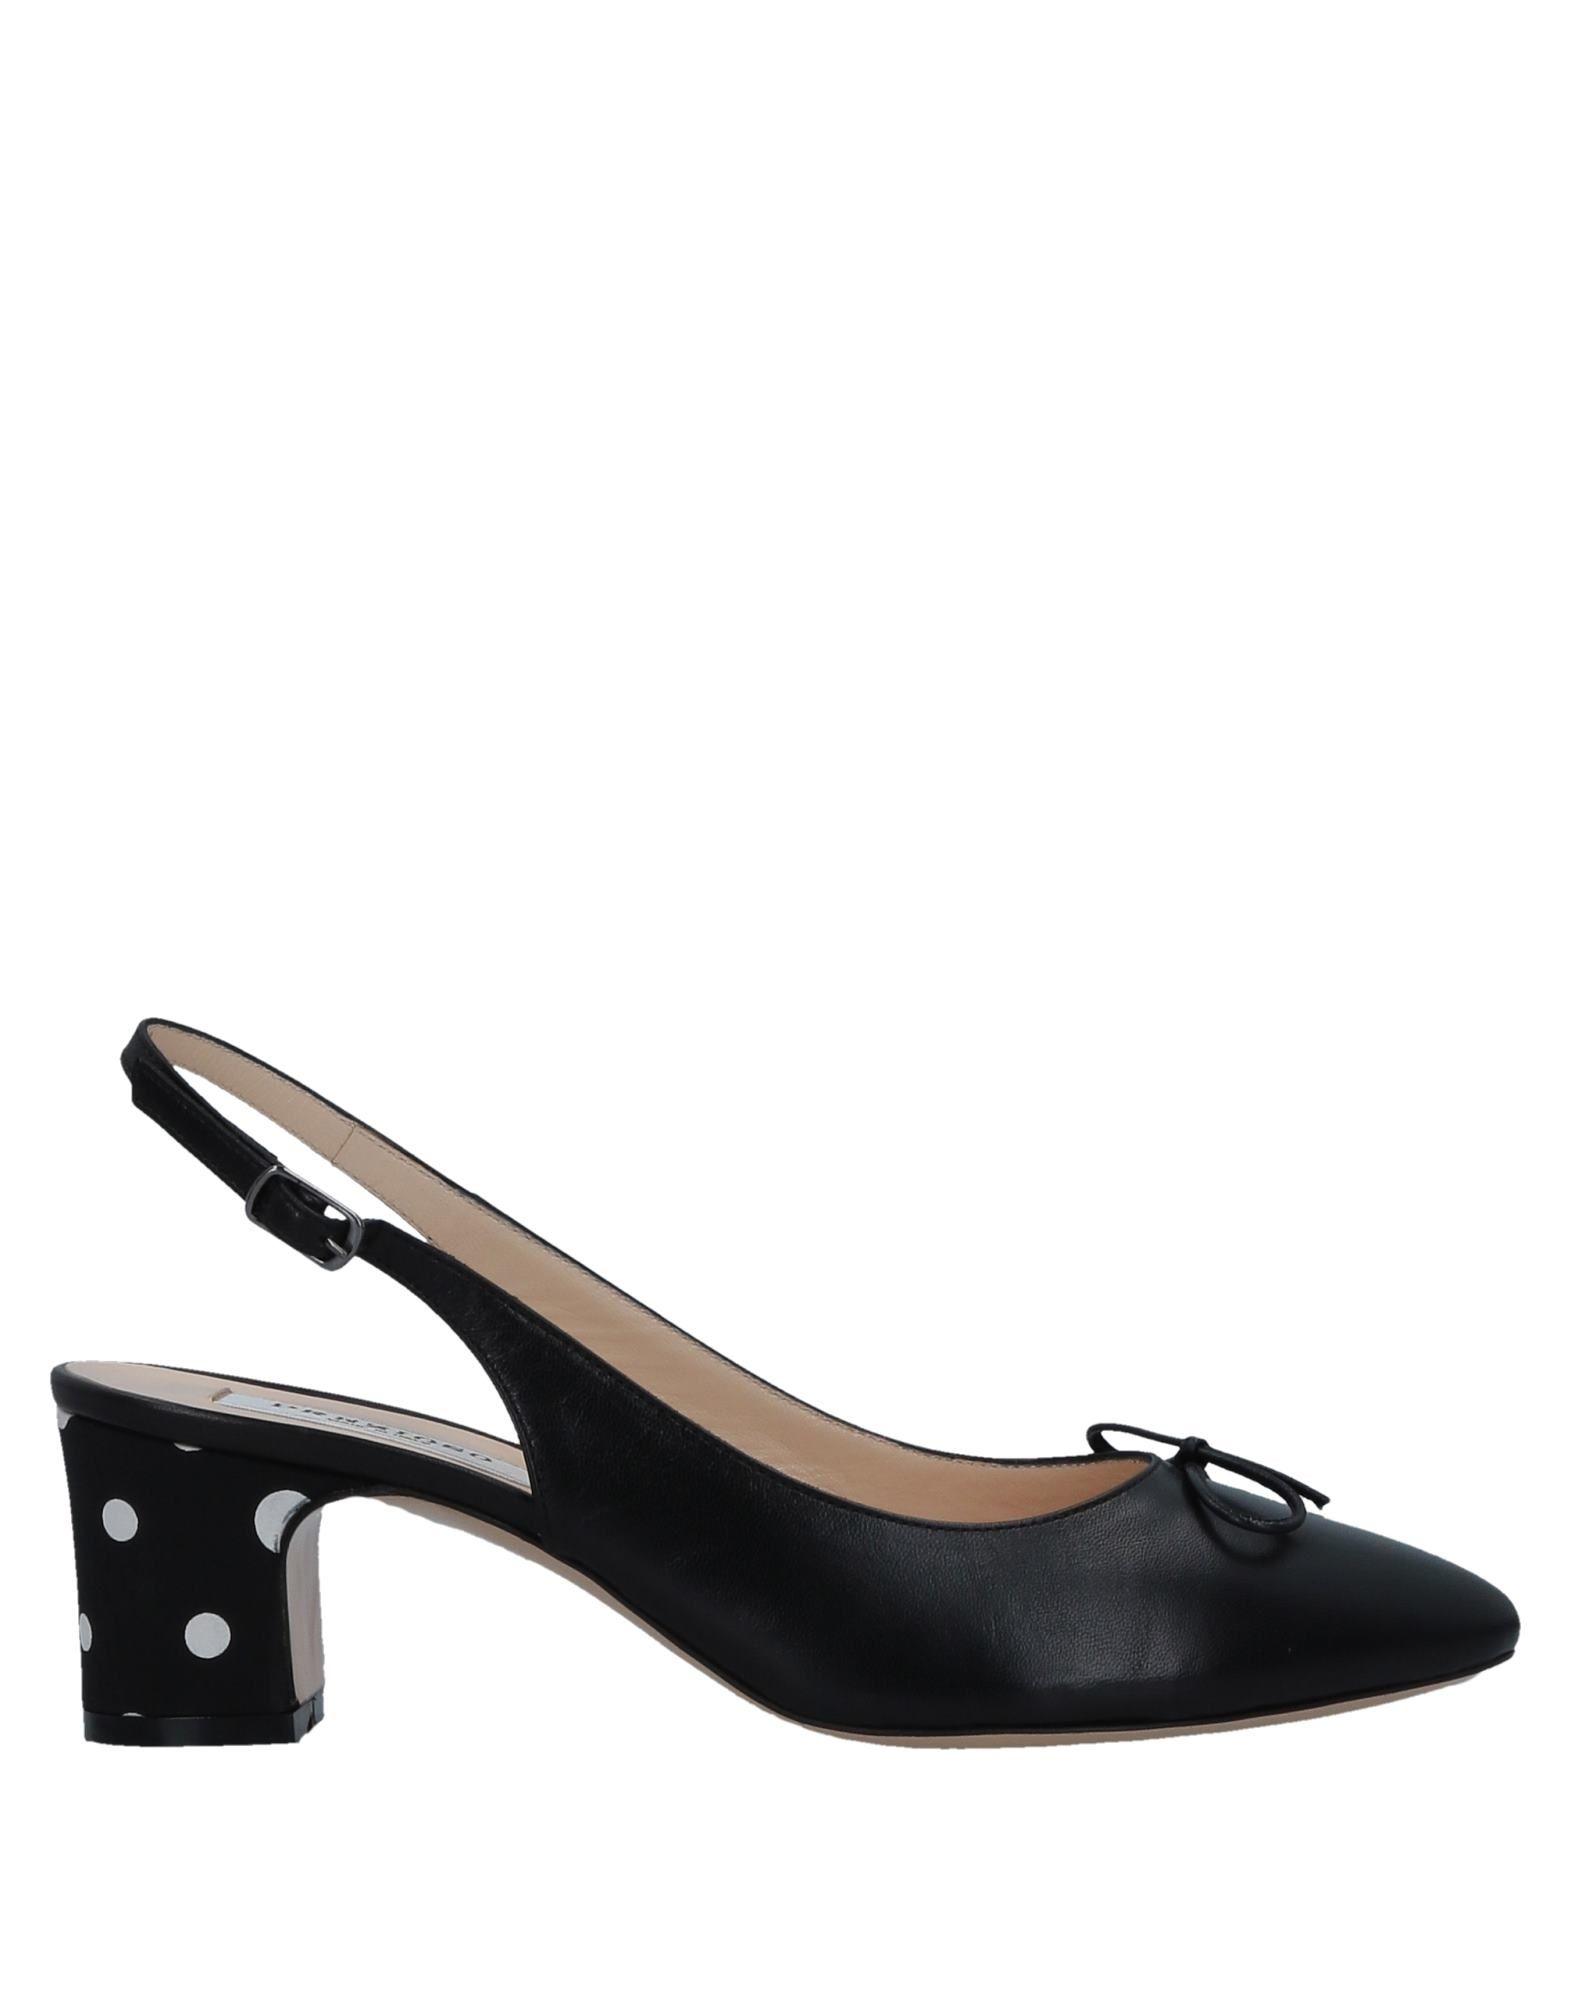 Prezioso Pumps Damen  11524970EK Gute Qualität beliebte Schuhe